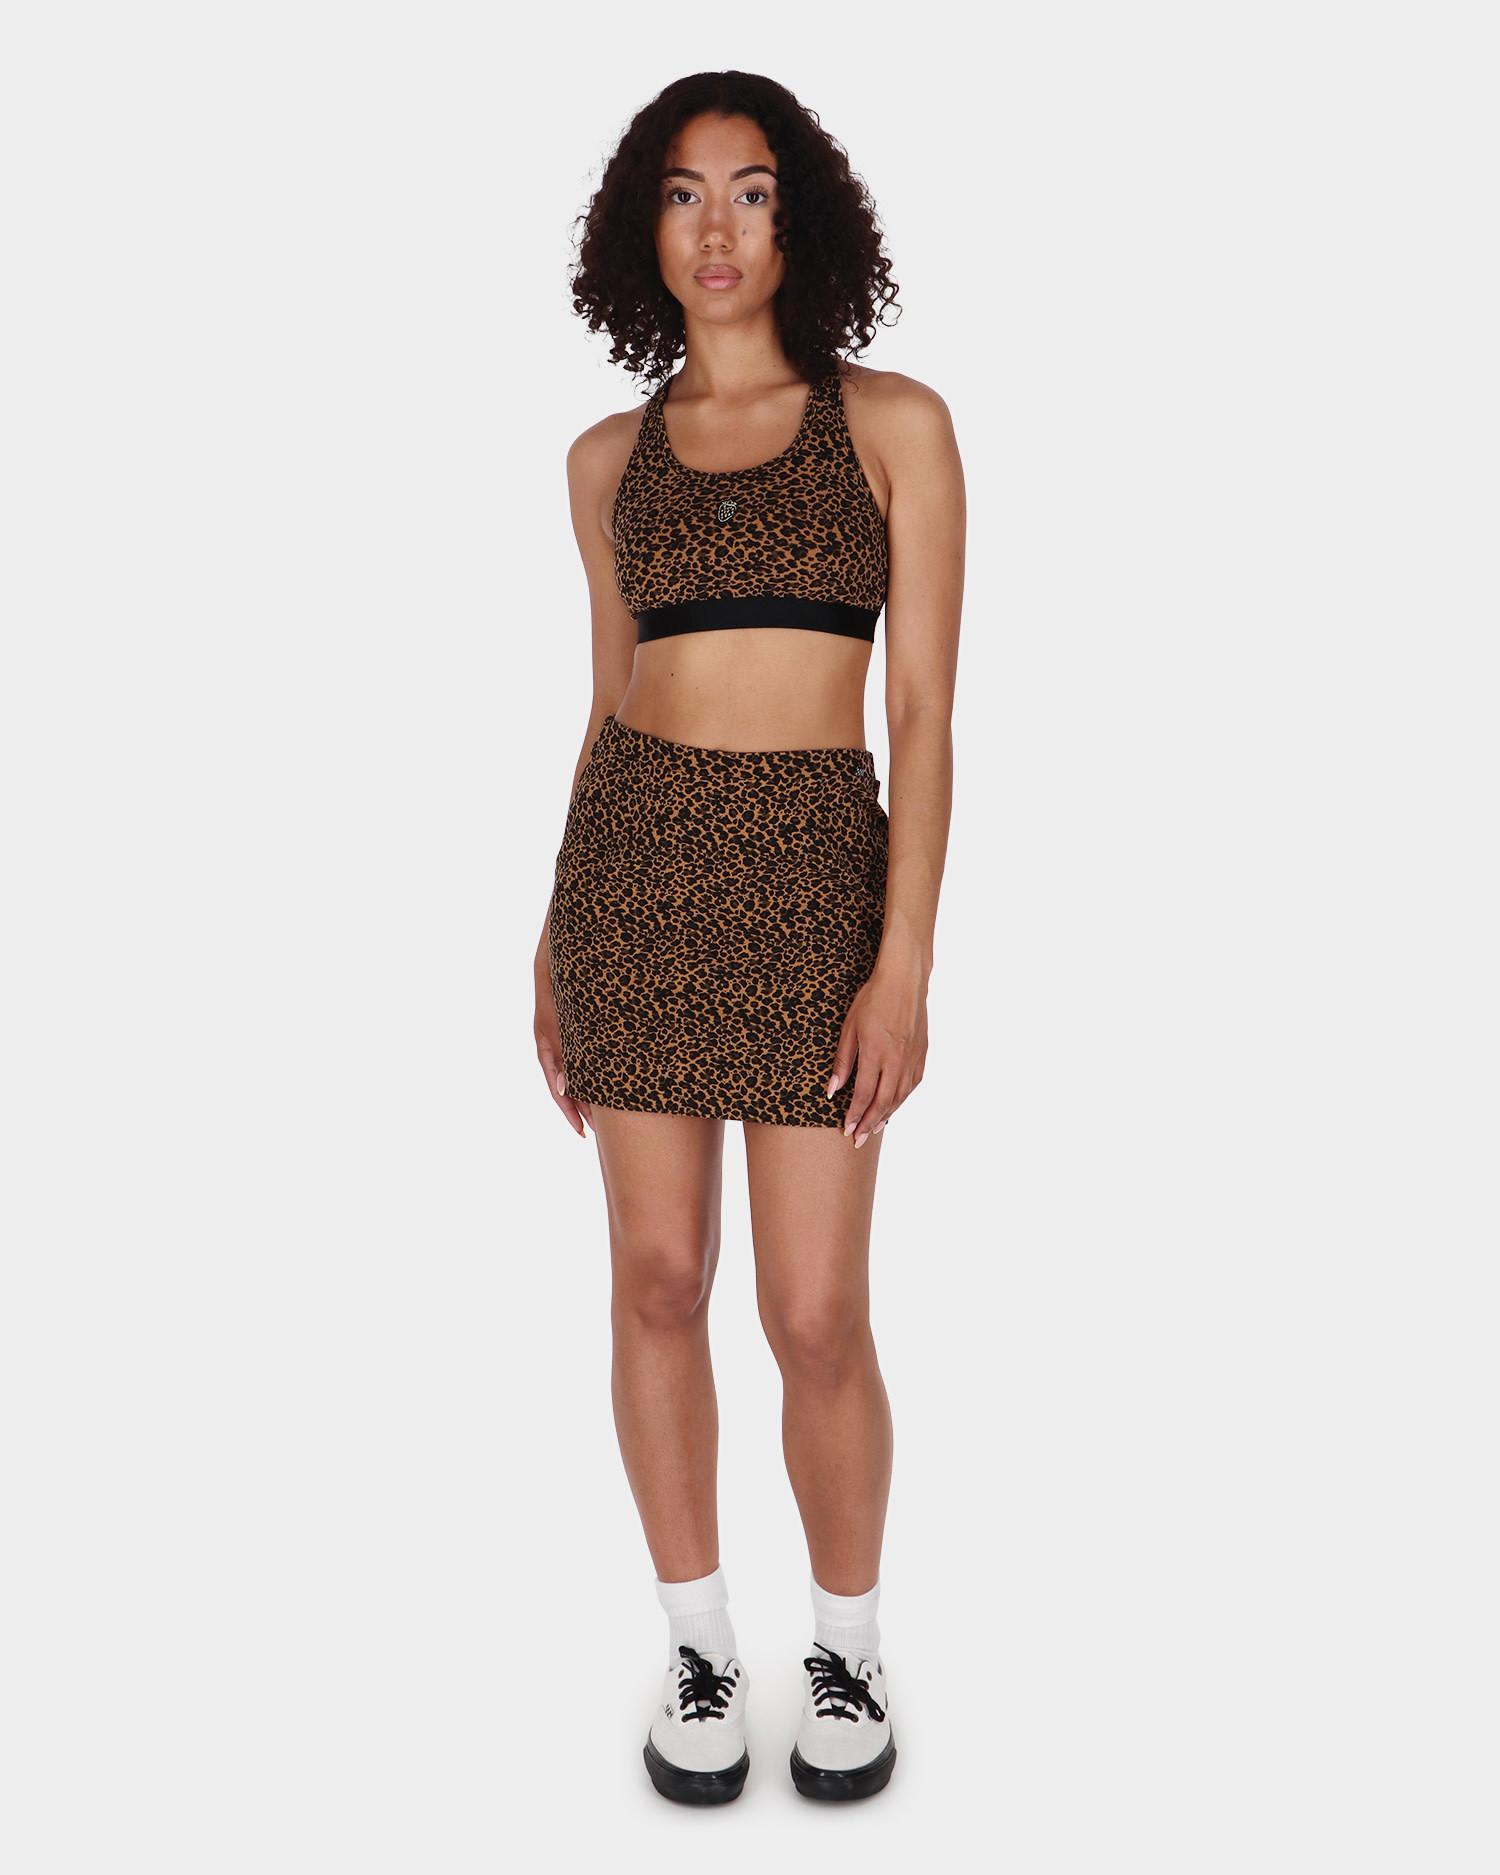 Vans Strauberry Leopard Skirt Cher Cheetah